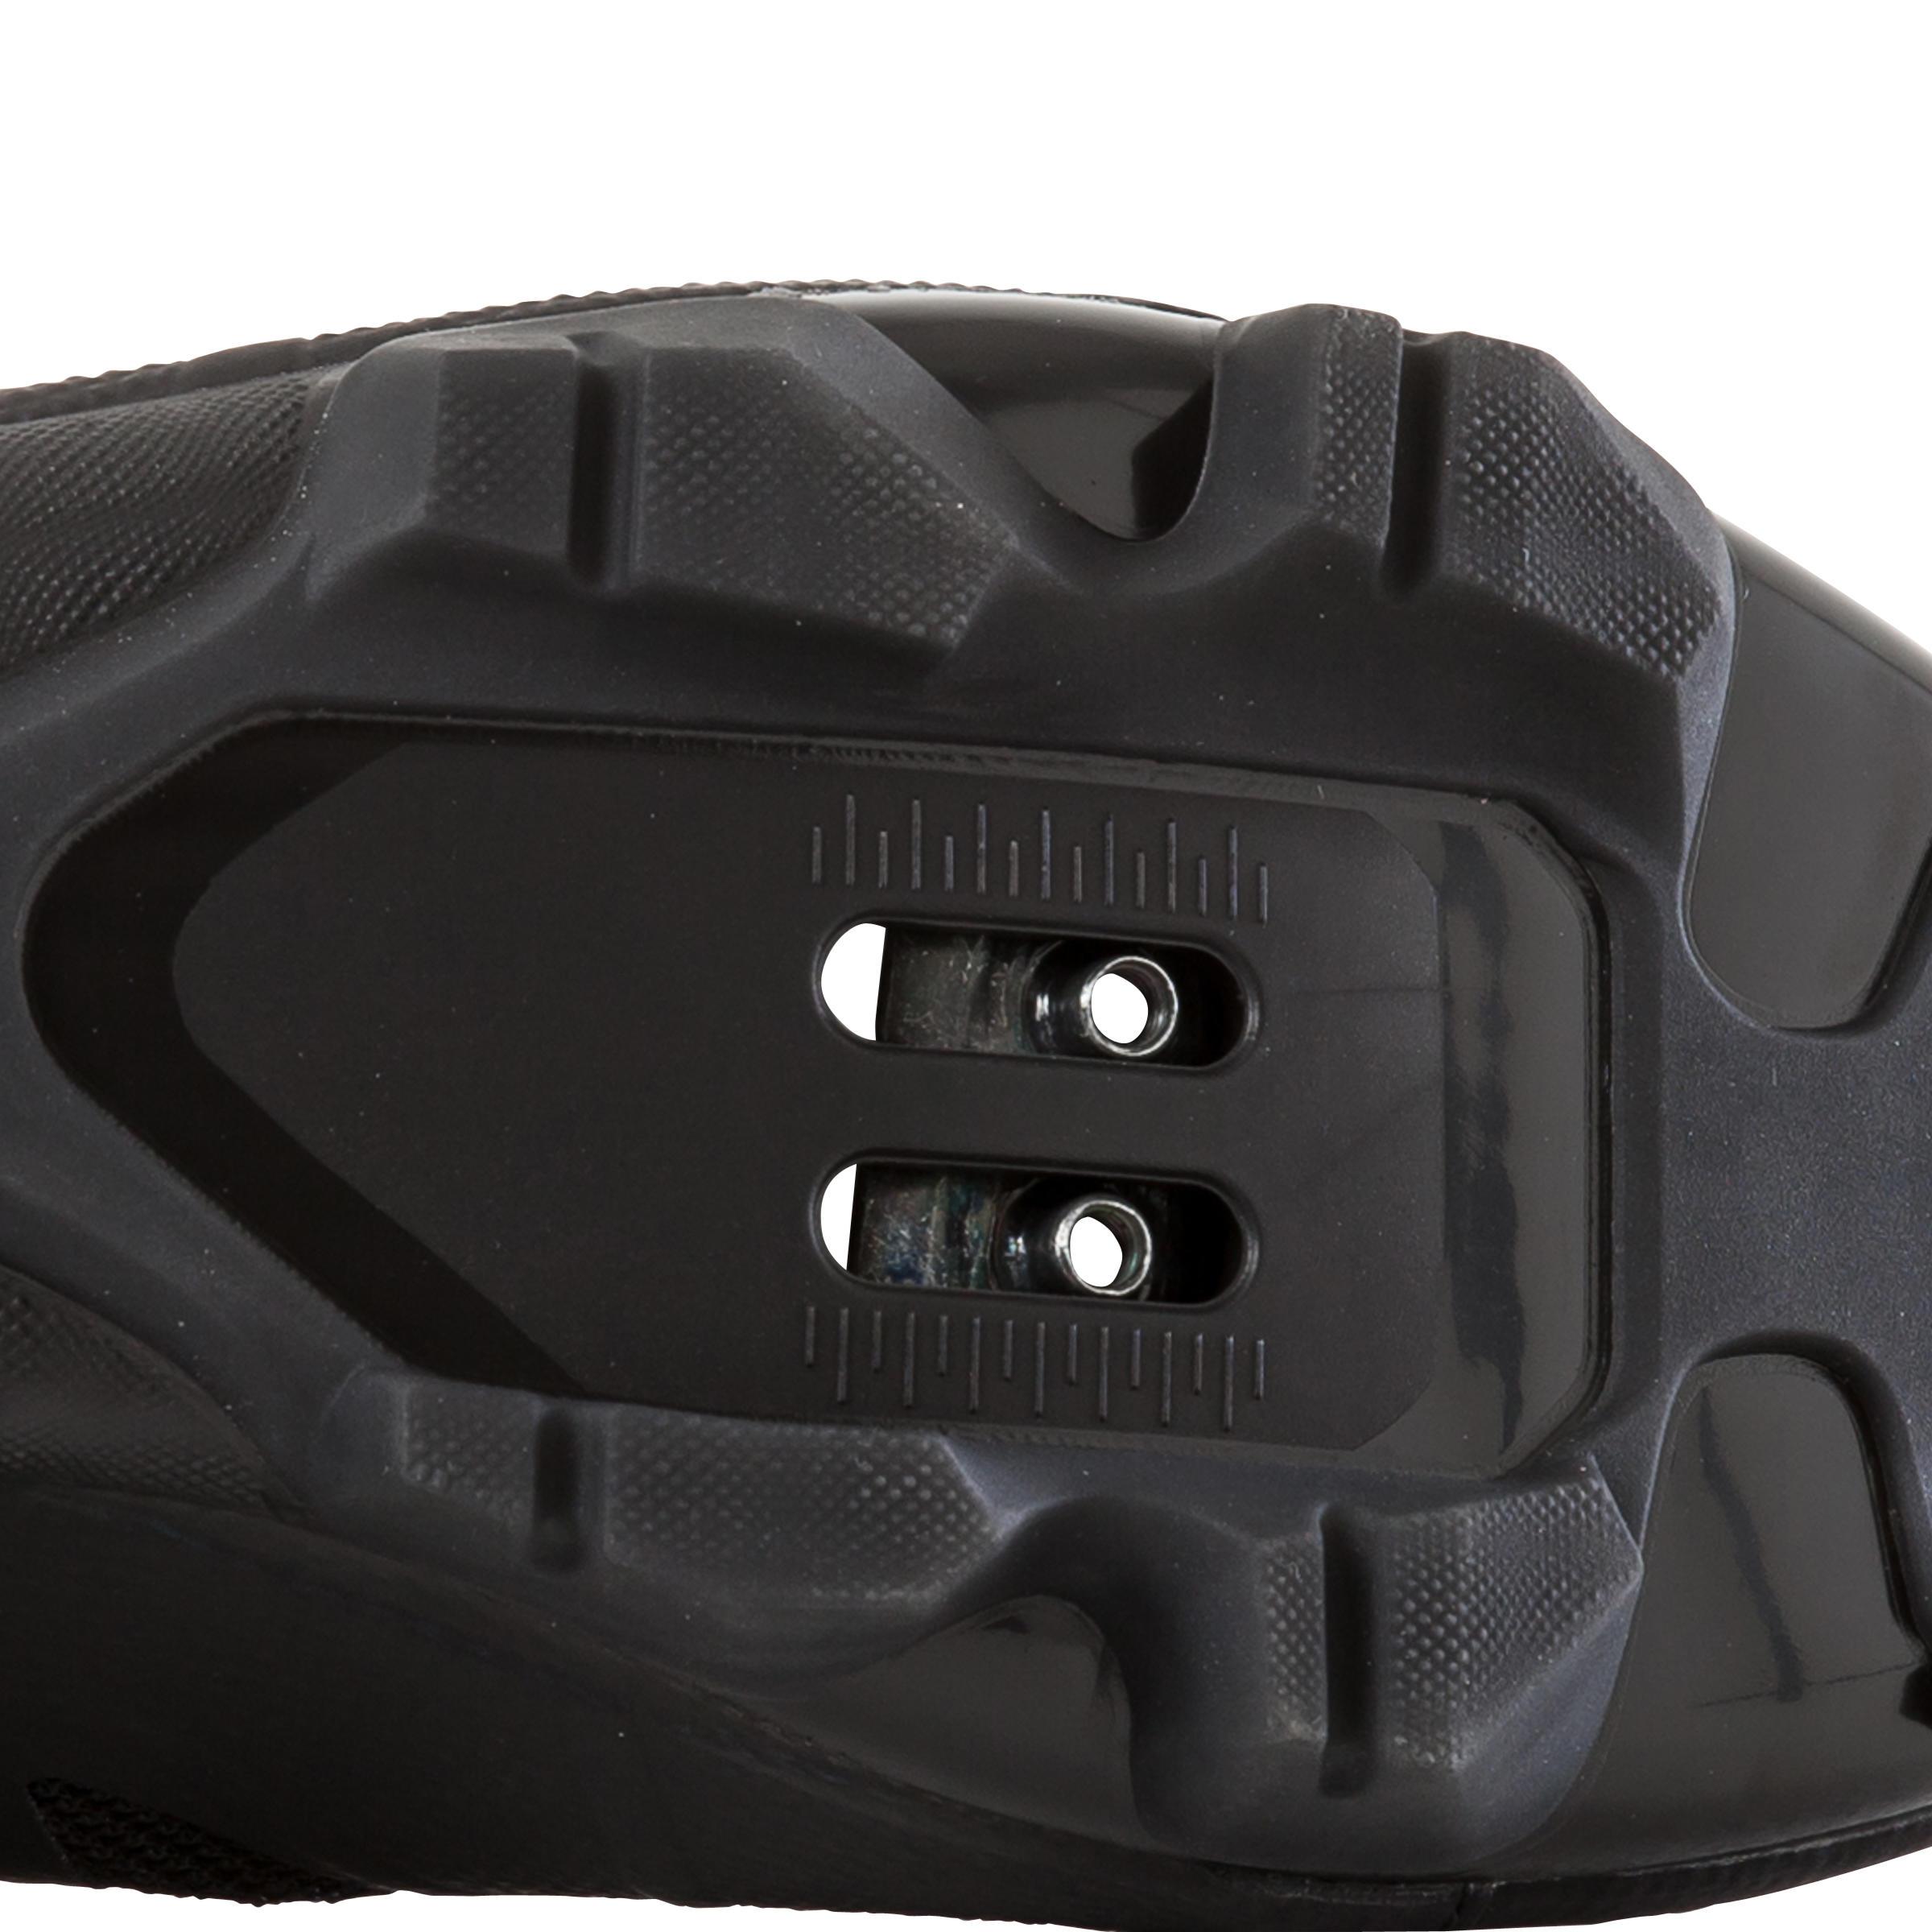 Noir 500 Chaussures Vtt Martinique Decathlon Xc zqwBfR